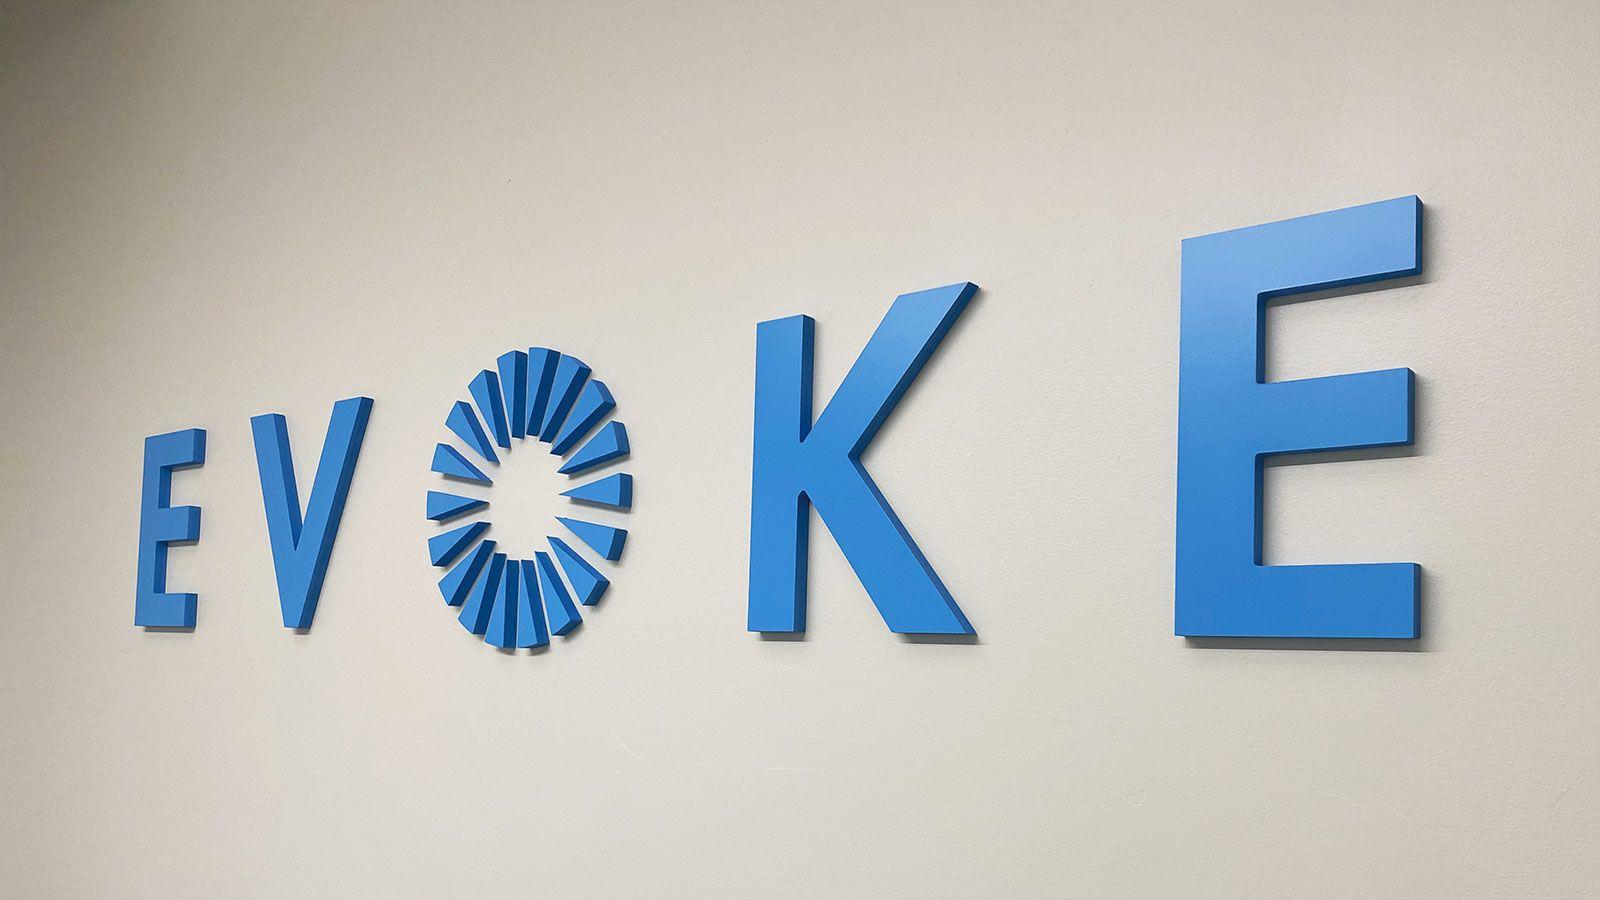 Evoke office acrylic sign